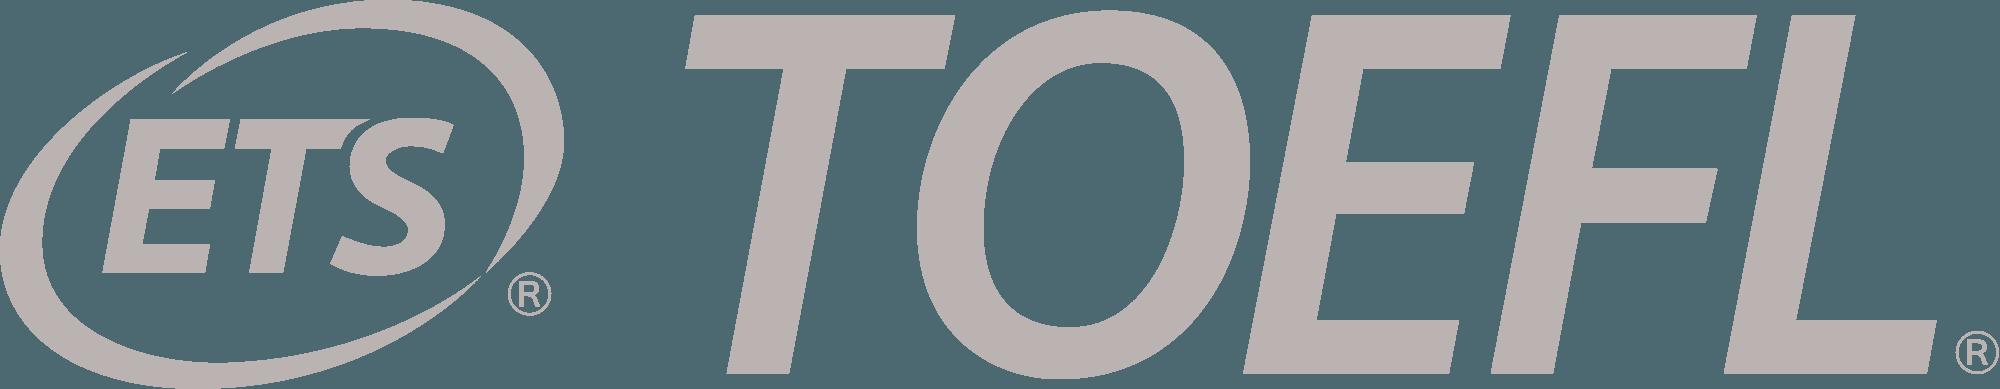 ICOI, Instituto de certificación oficial de idiomas de la camara de comercio de A Coruña, certificaciones oficiales en A Coruña, academias de ingles coruña